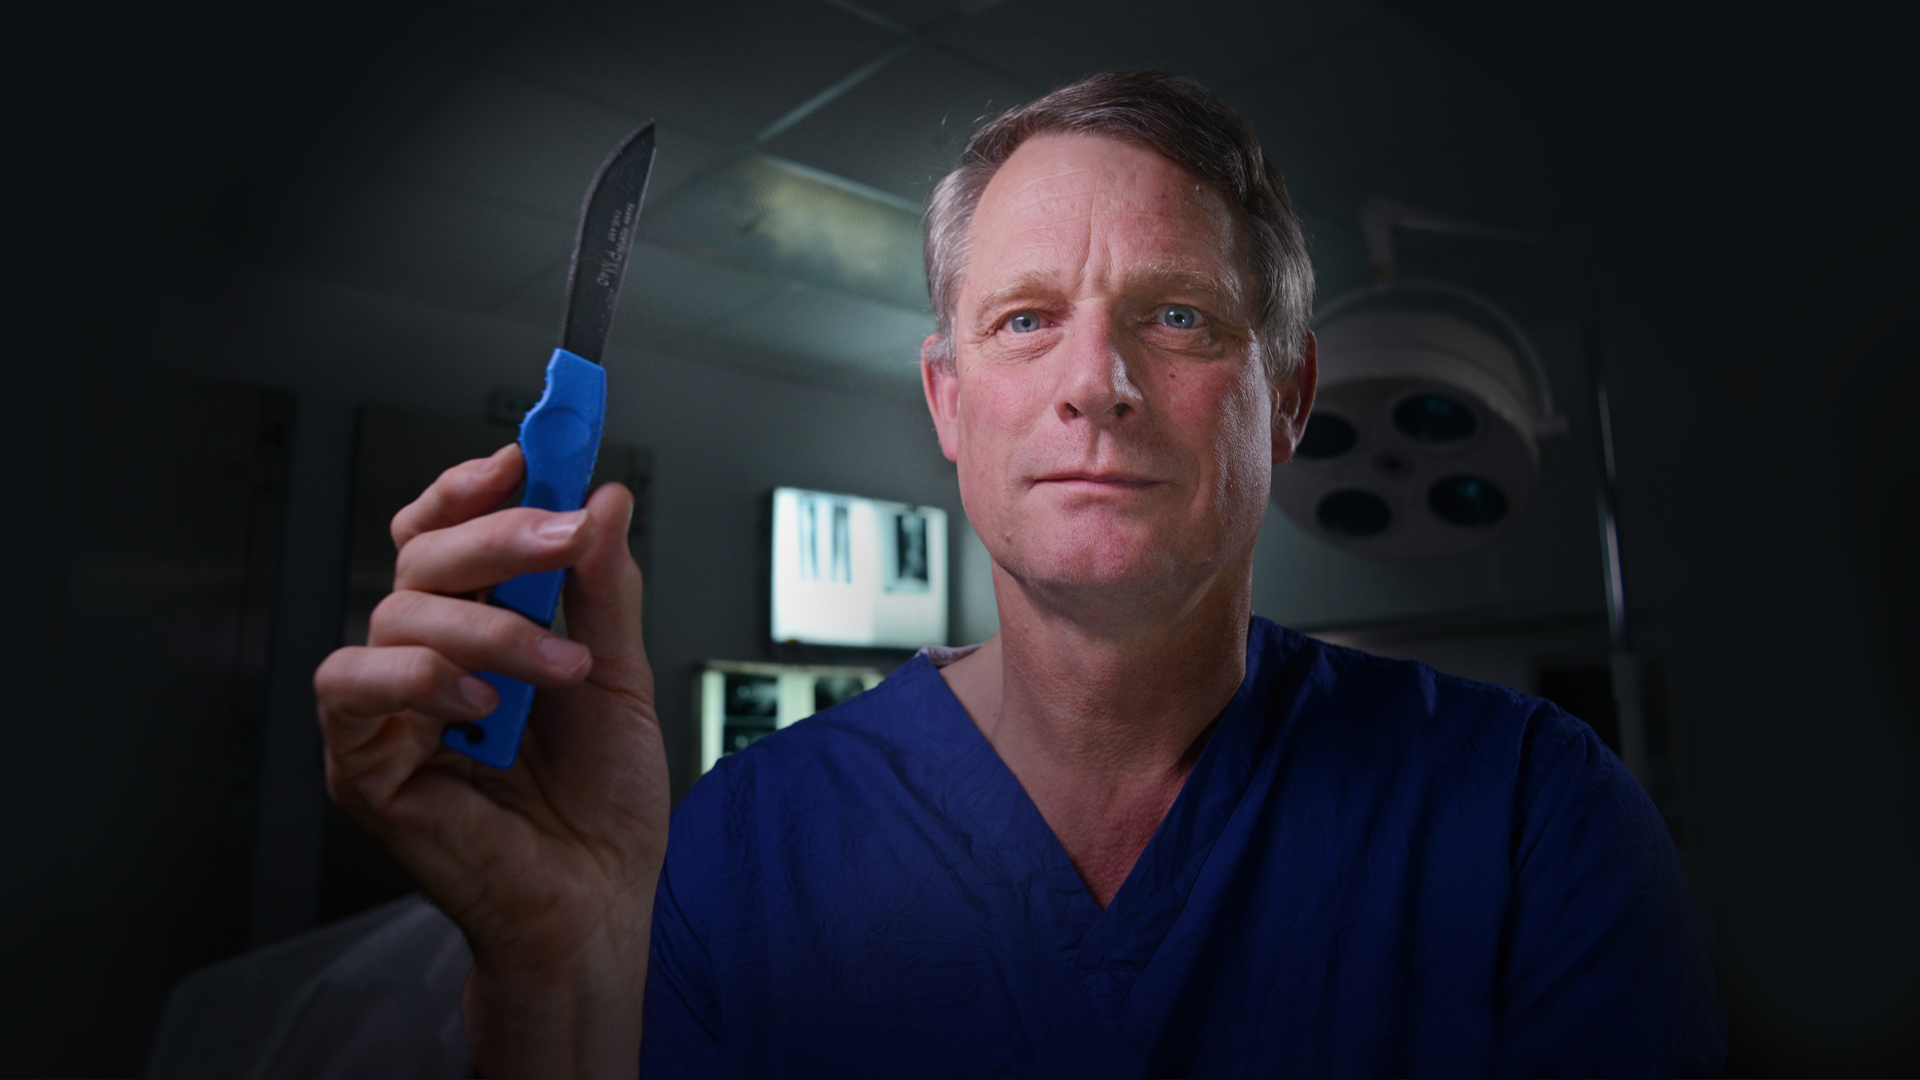 Dr Richard Shepherd holding up a scalpel - promotional image